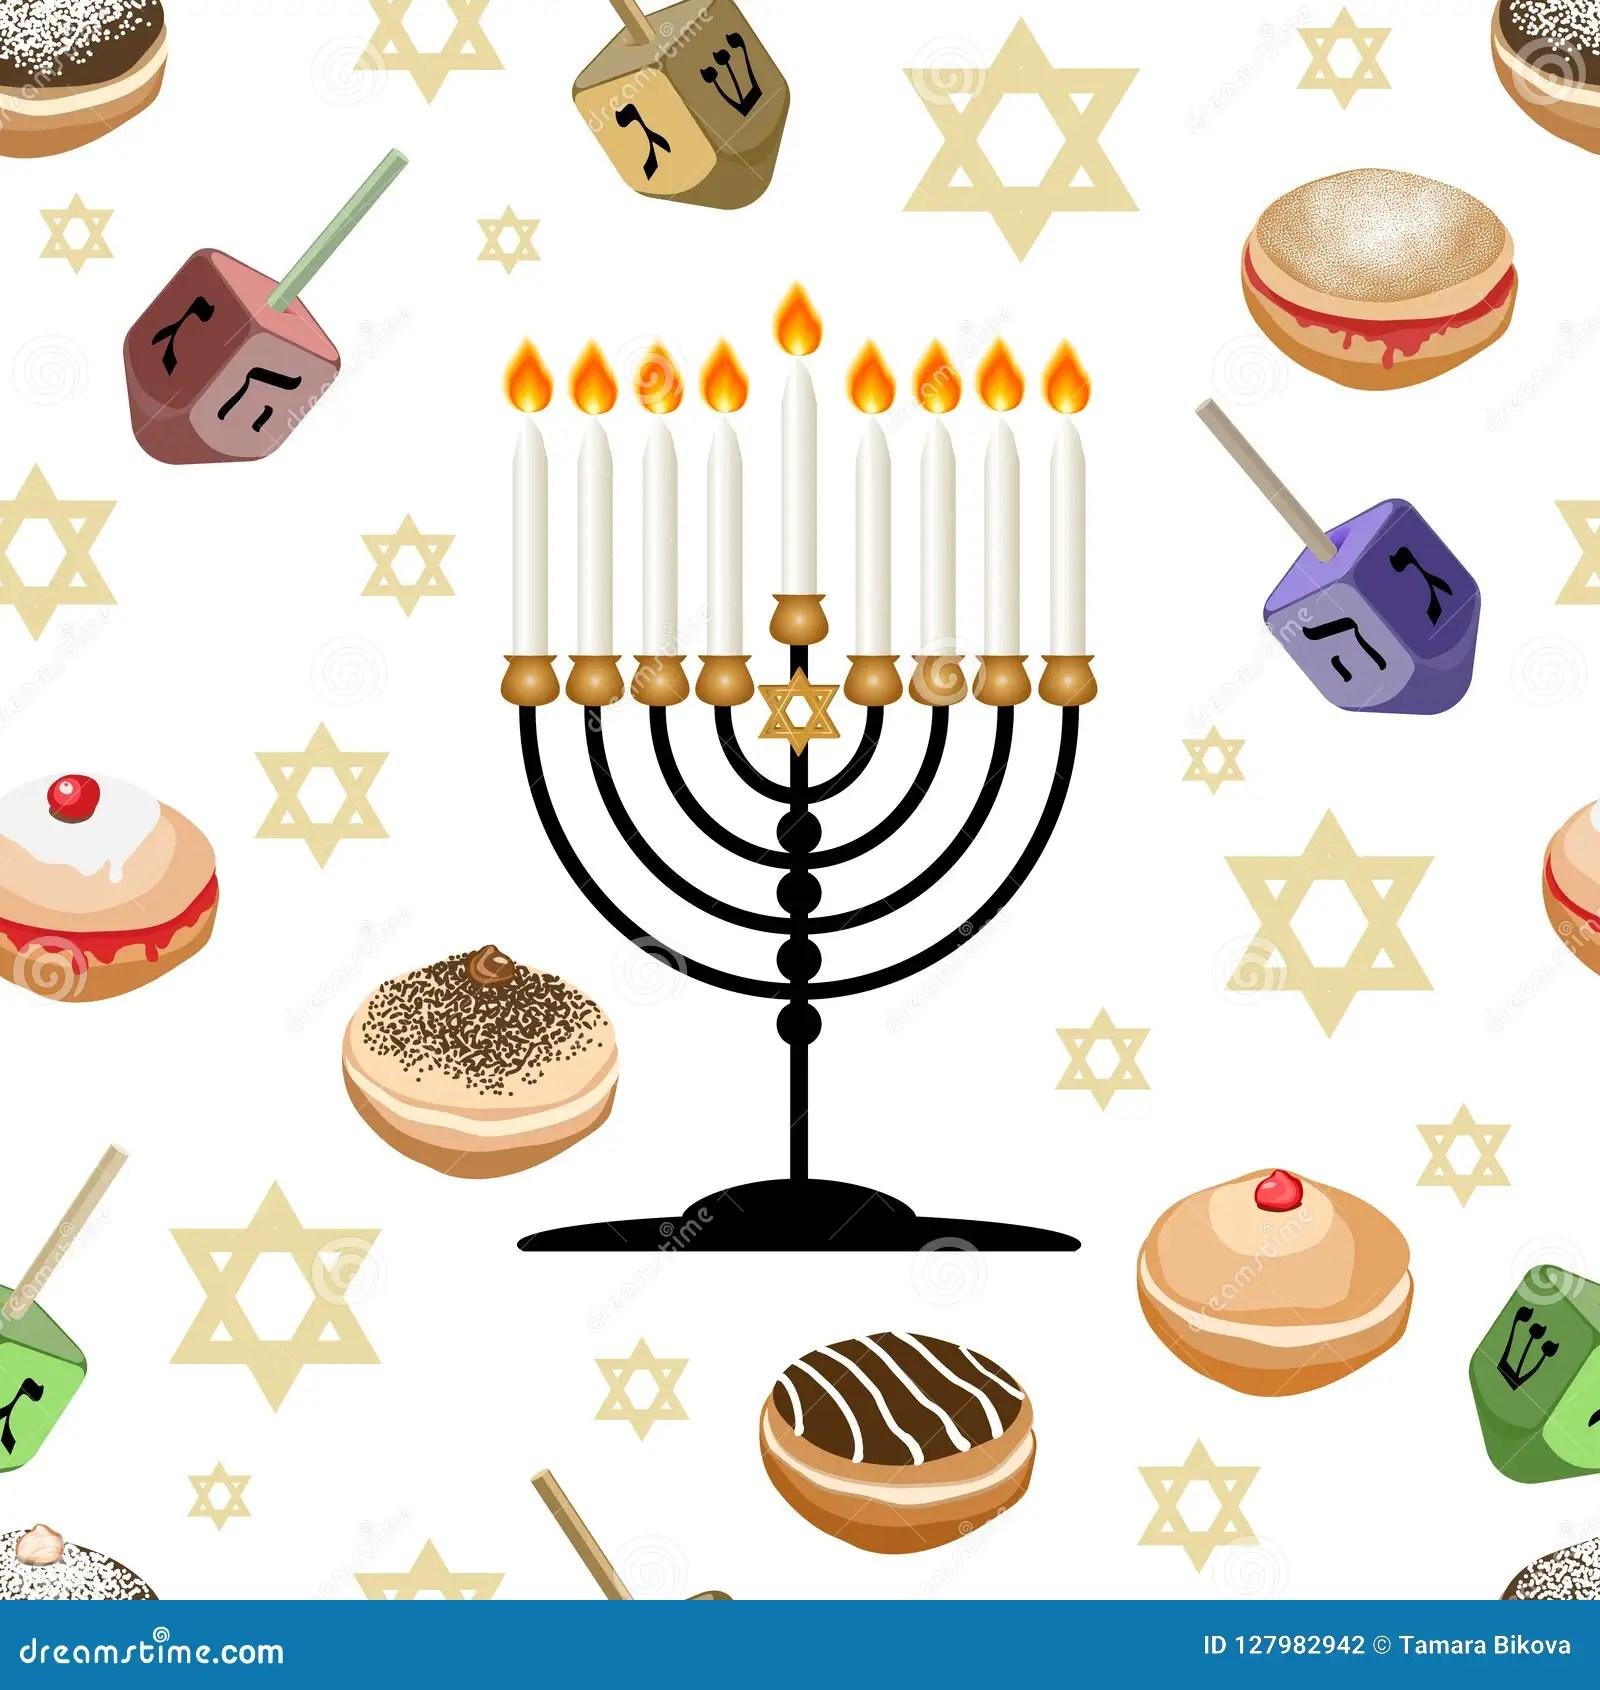 Hanukkah Symbols Pictures